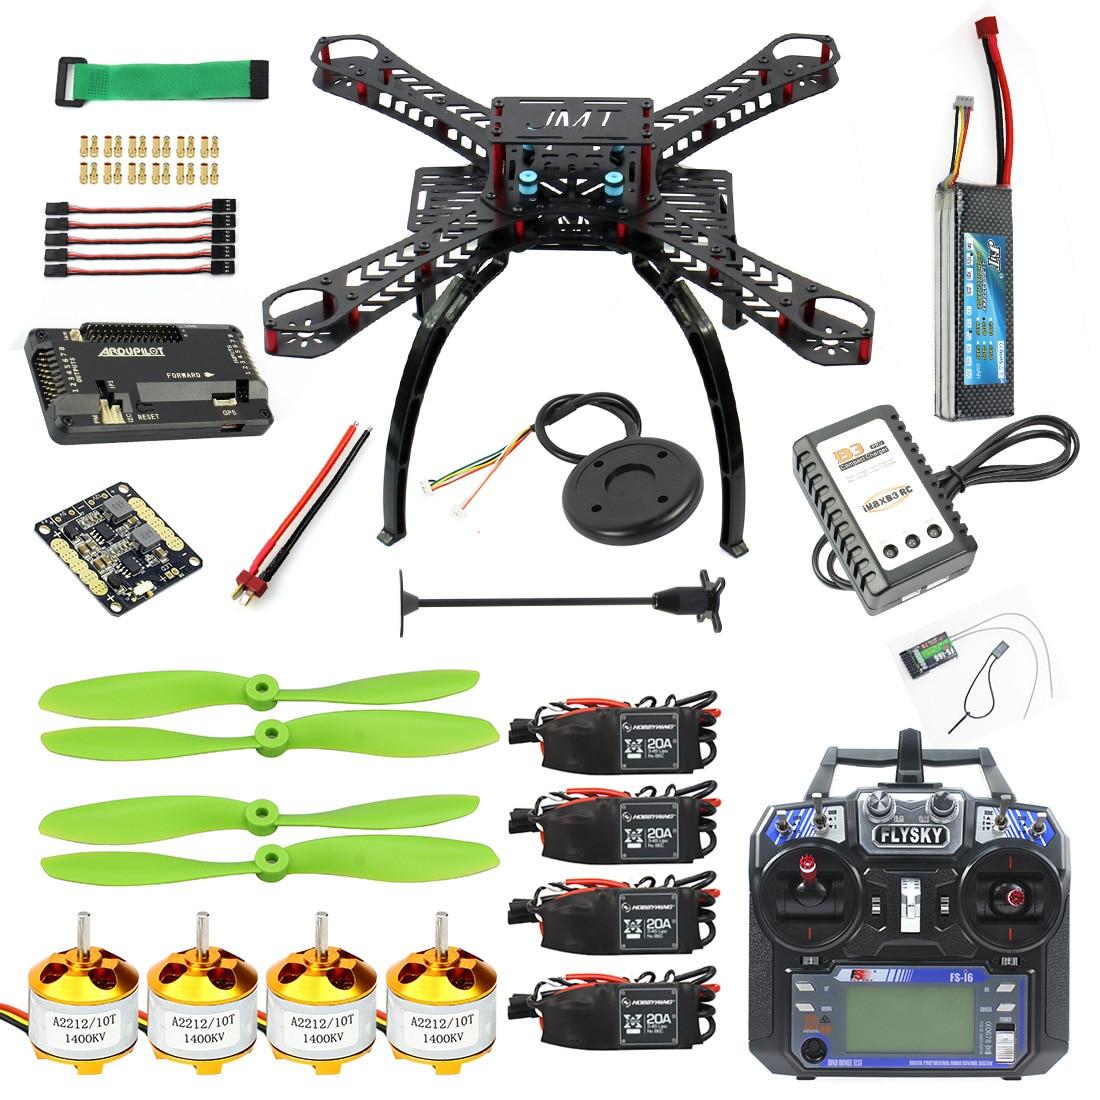 DIY Kit GPS Drone RC Carbon Fiber Frame Multicopter FPV APM2.8 1400KV Motor 20A ESC flysky 2.4GFS i6 Transmitter Receiver